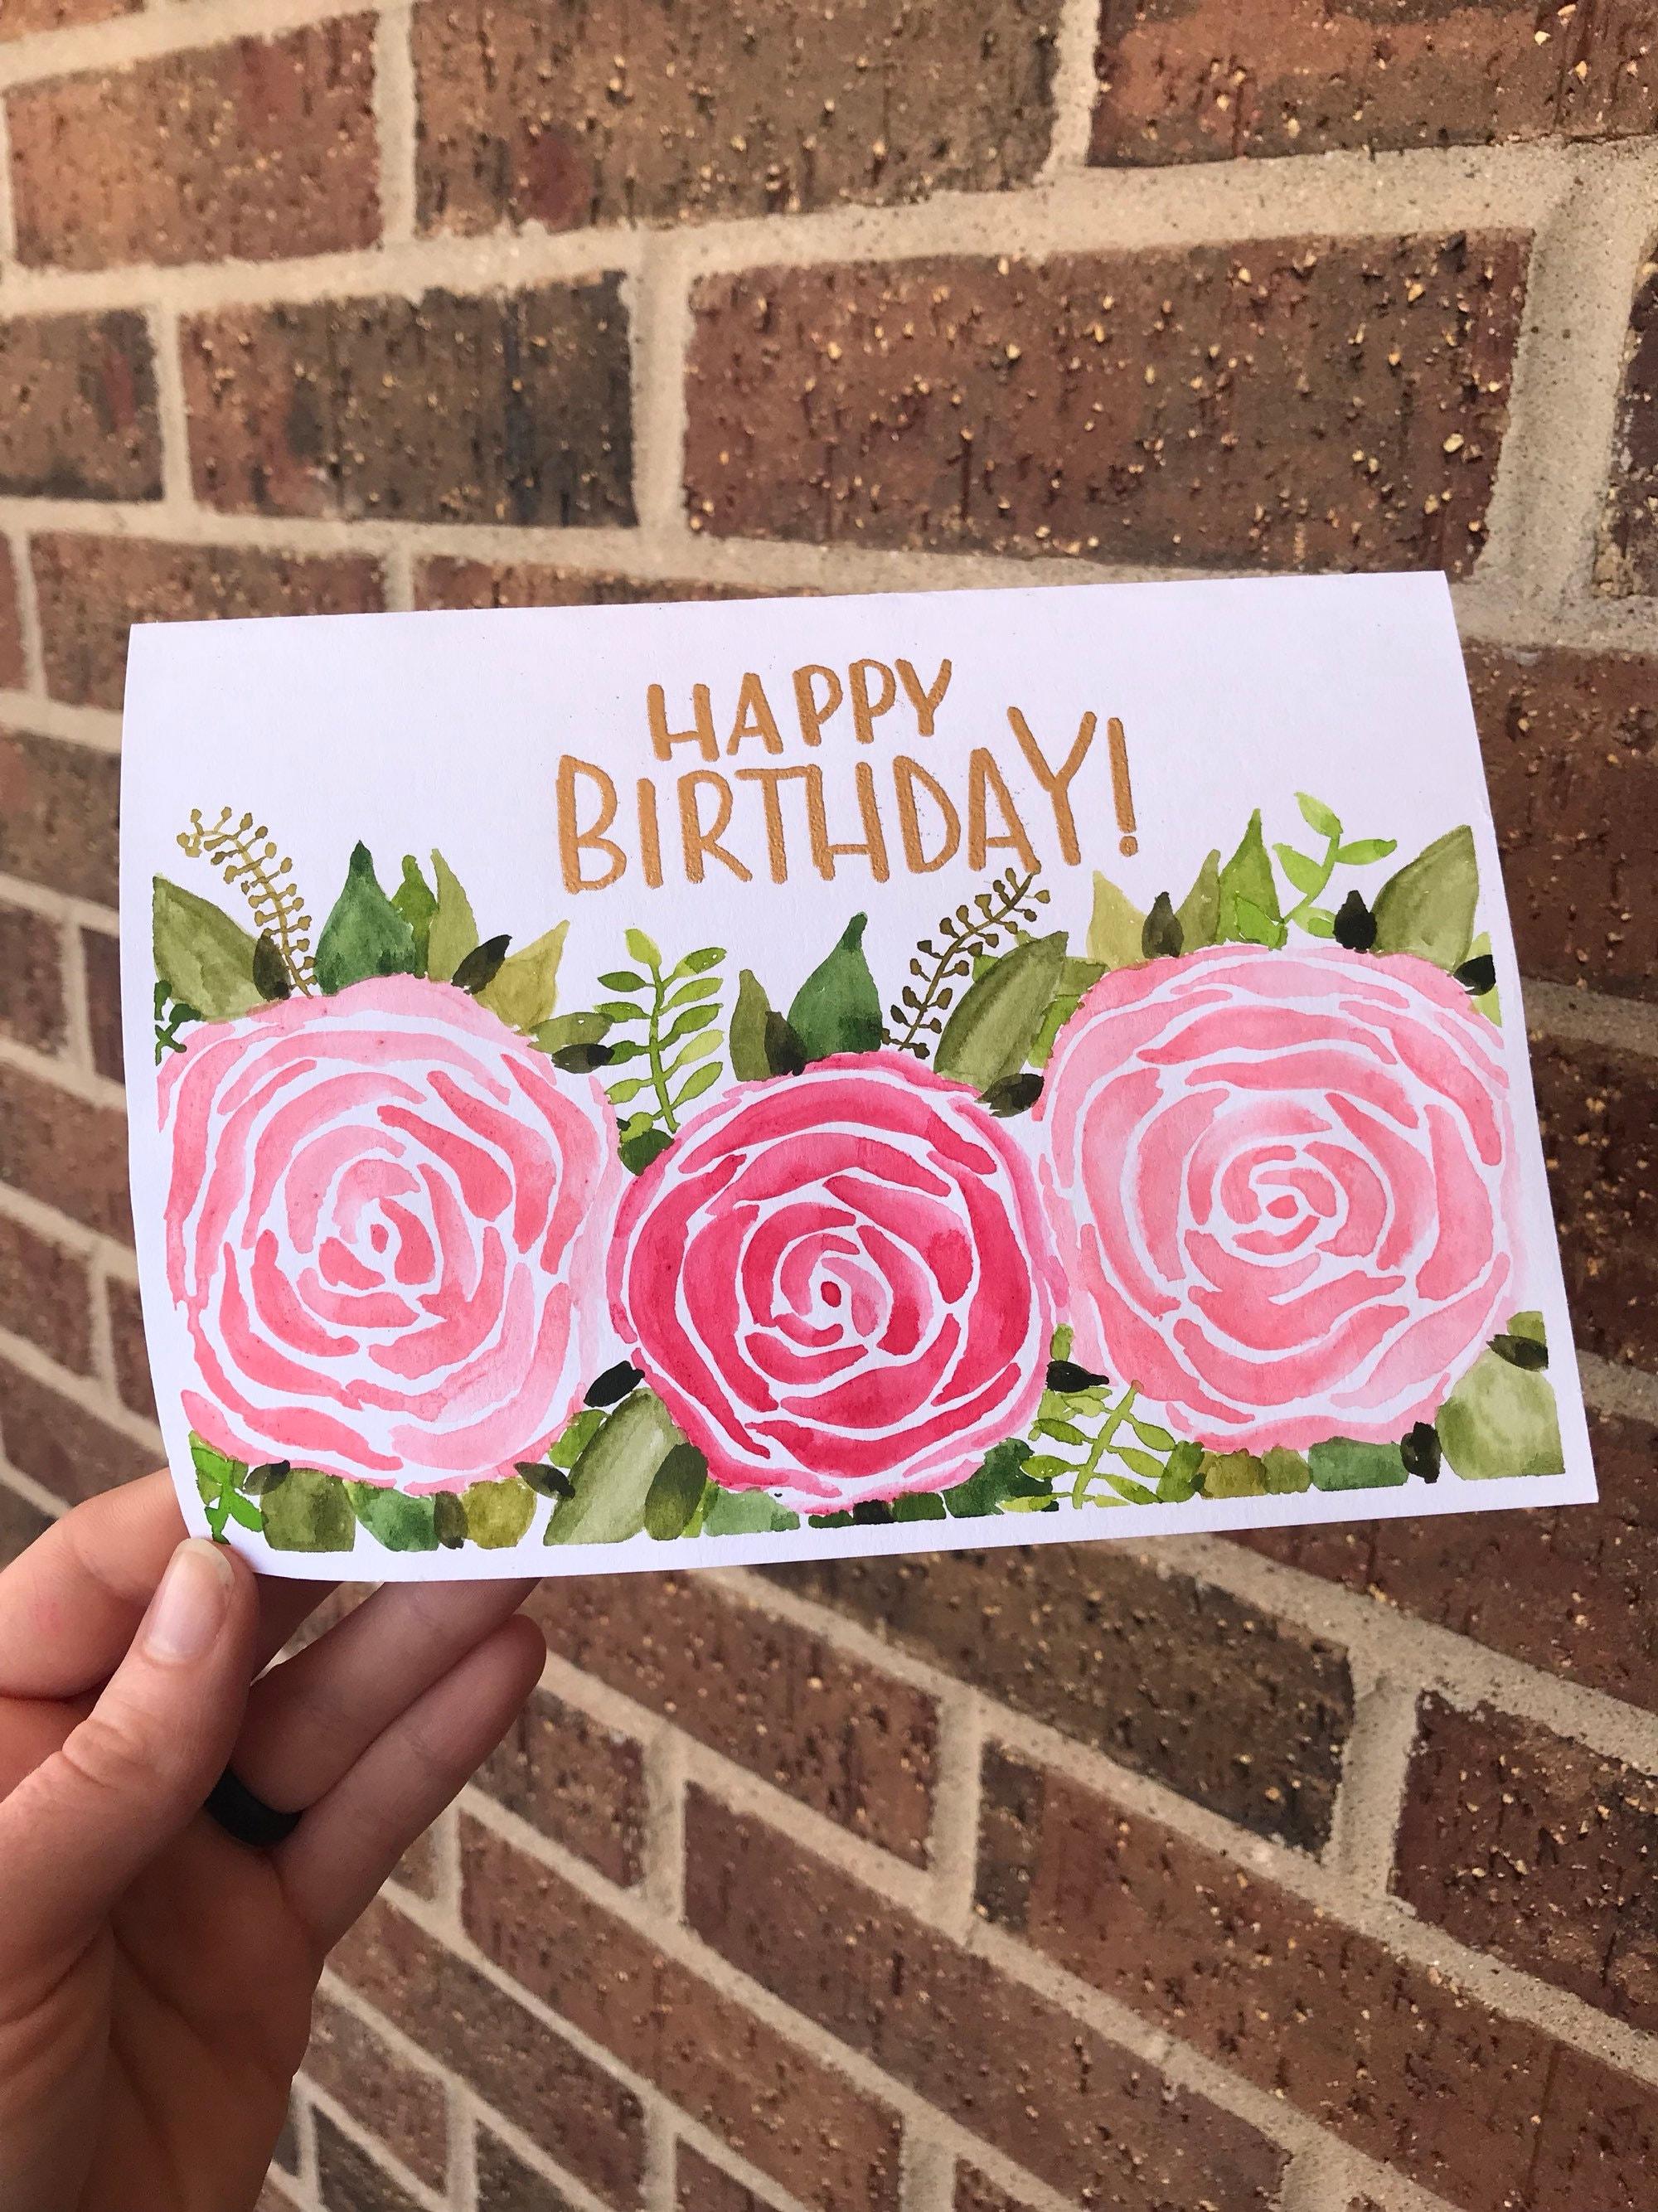 Happy birthday card pink roses flowers handpainted etsy image 0 izmirmasajfo